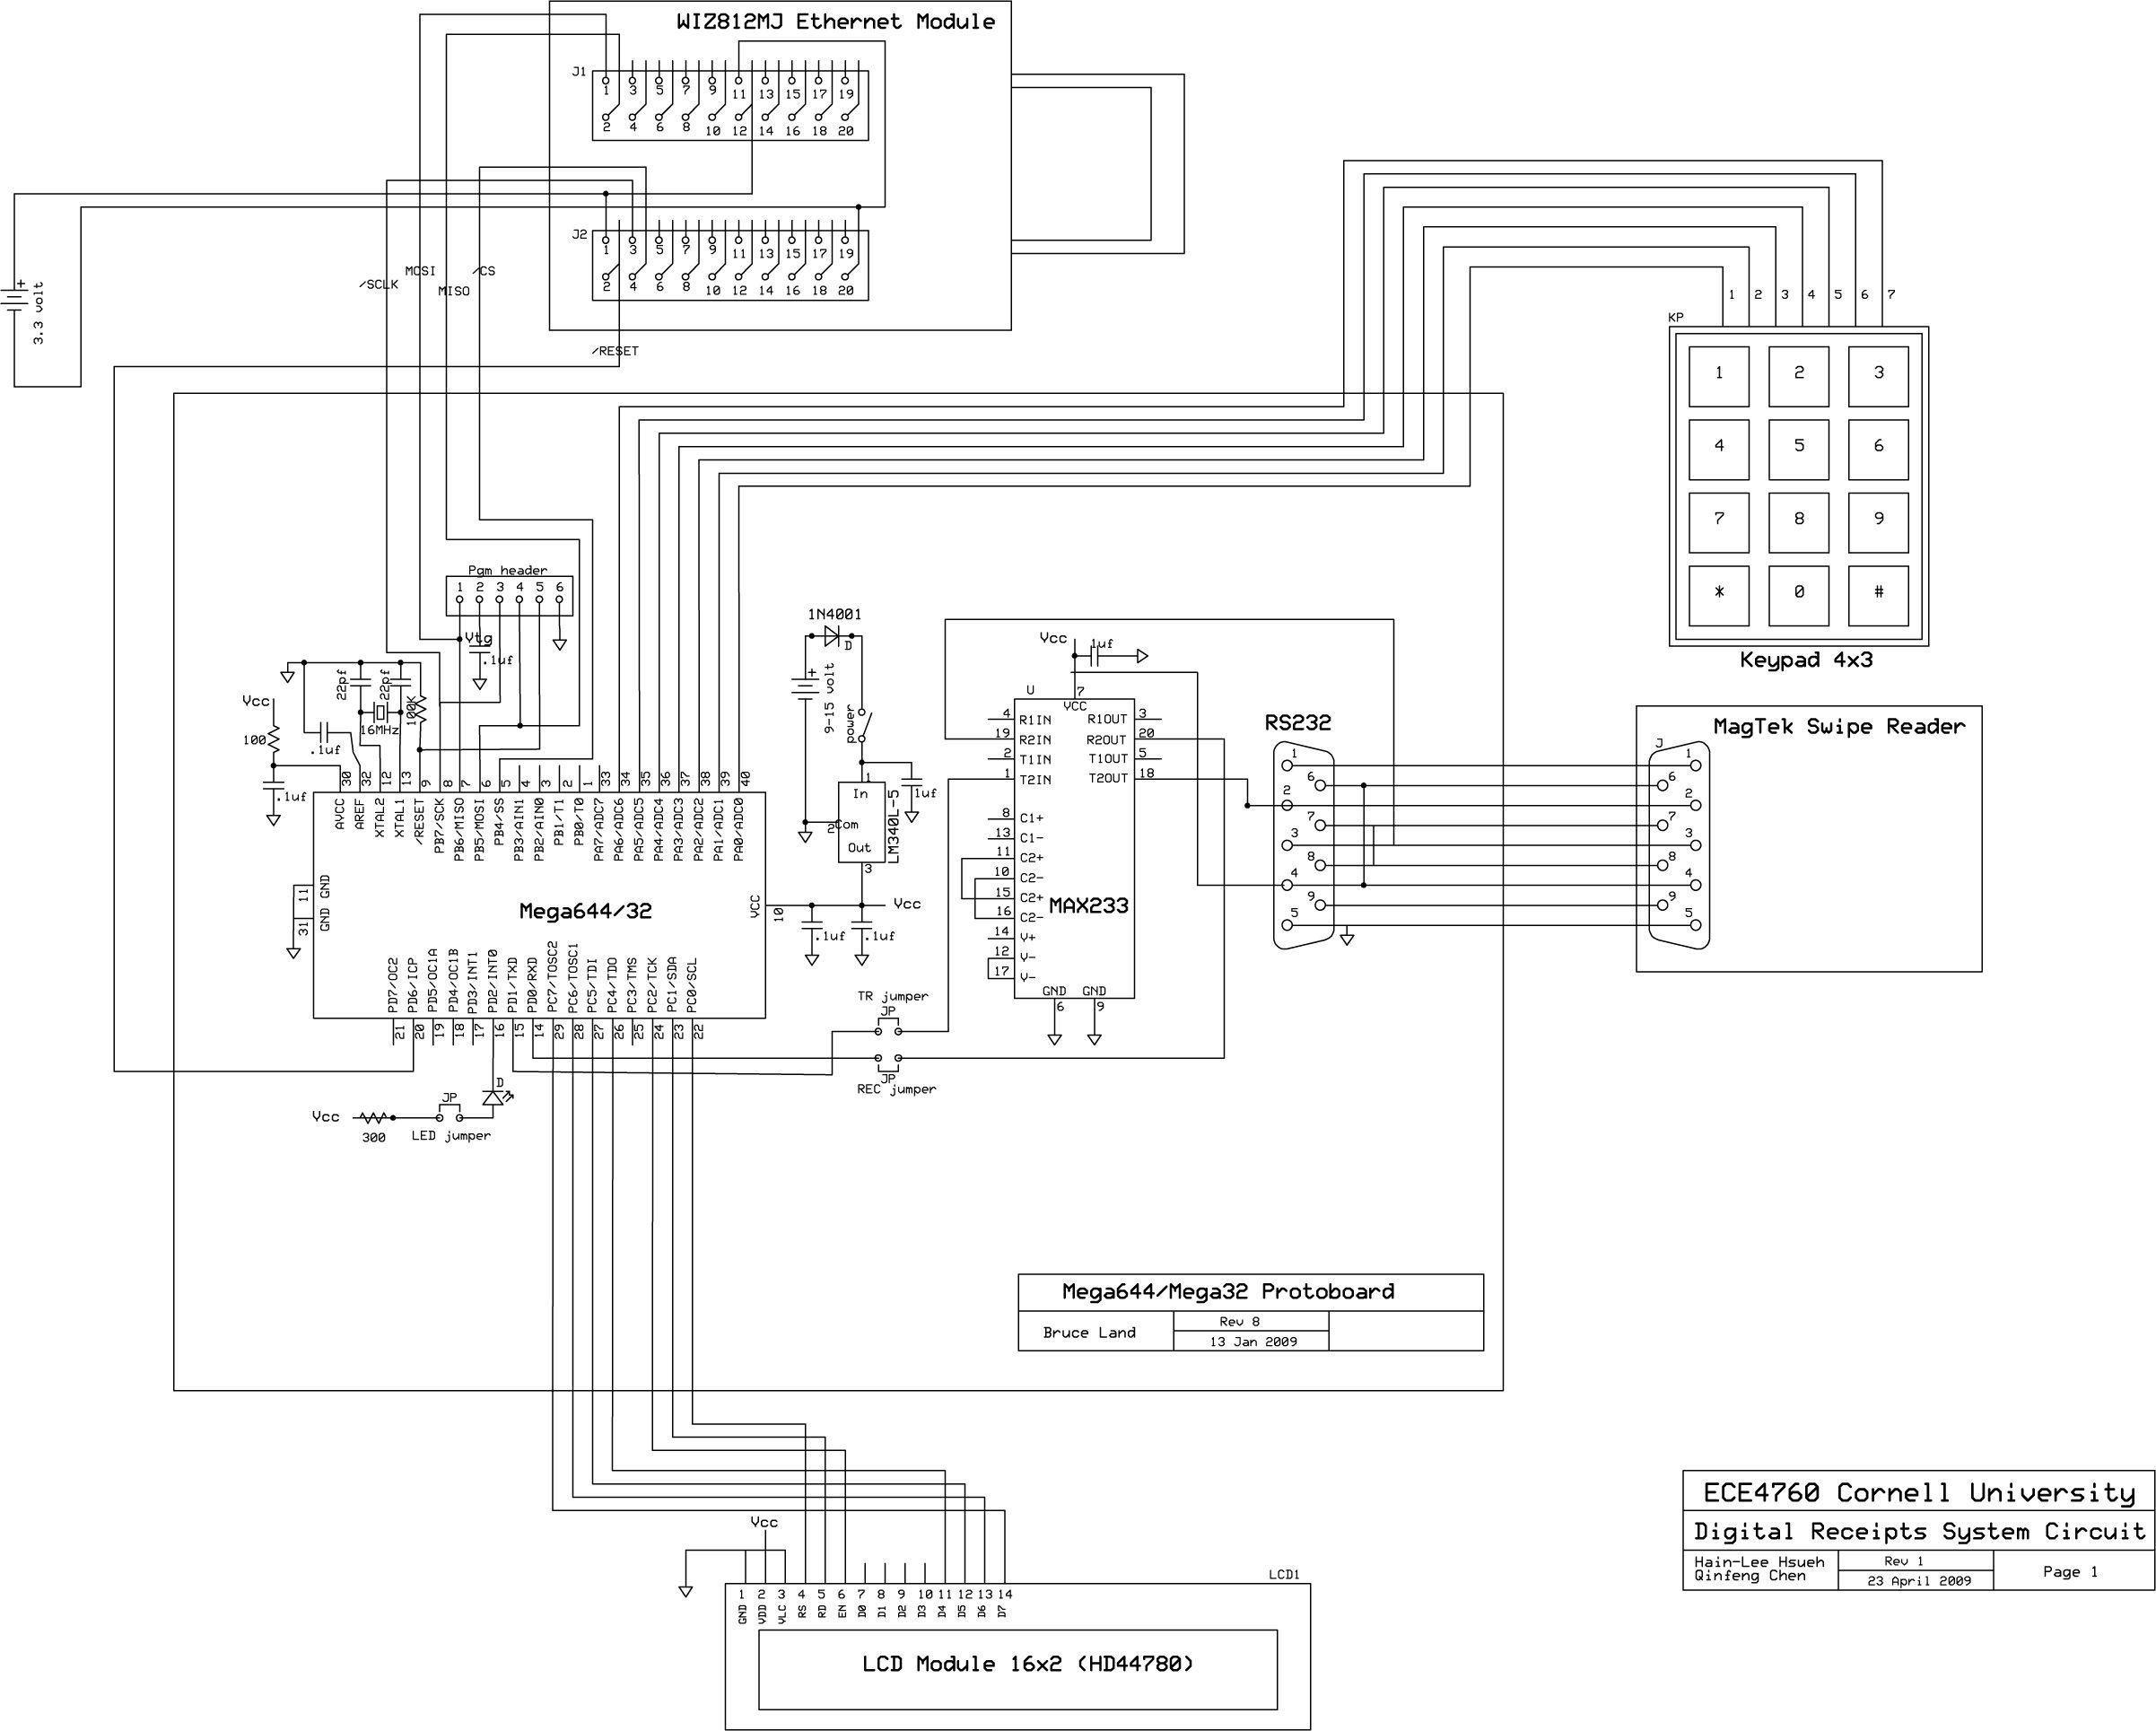 Digital Receipts System Using Atmega644 Schemetic.jpg